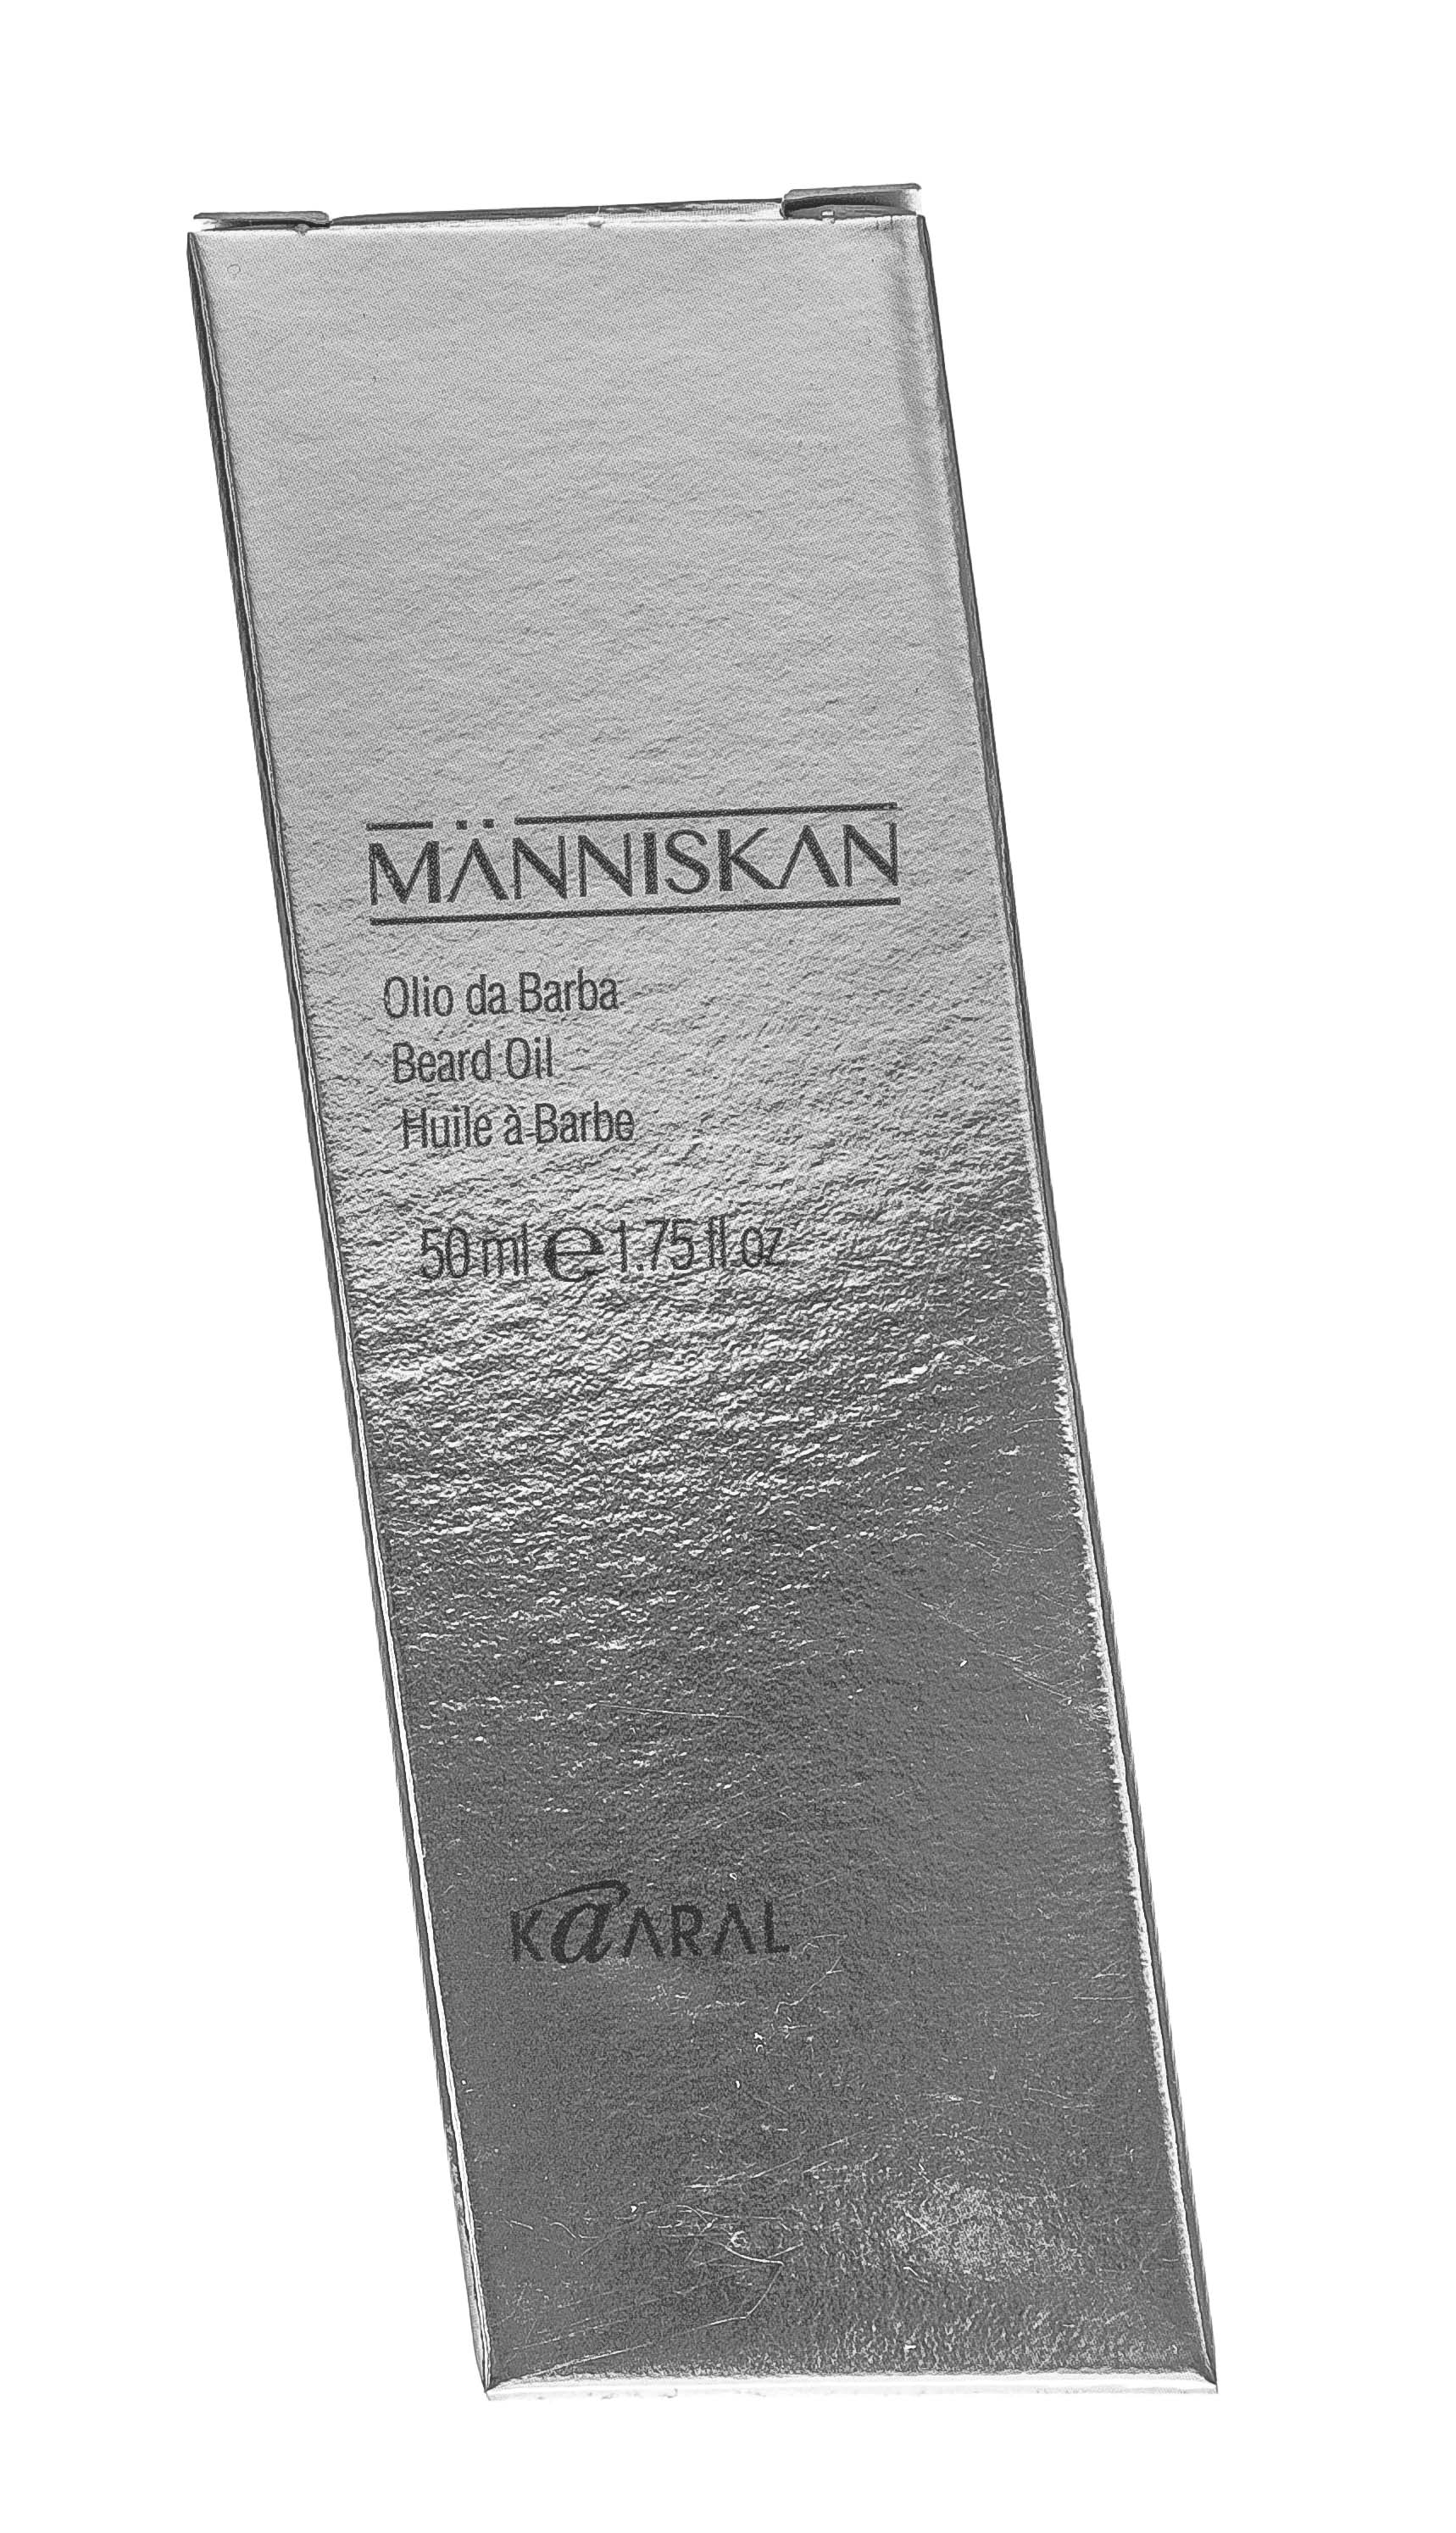 Купить Kaaral Масло для бороды 50 мл (Kaaral, Manniskan), Италия